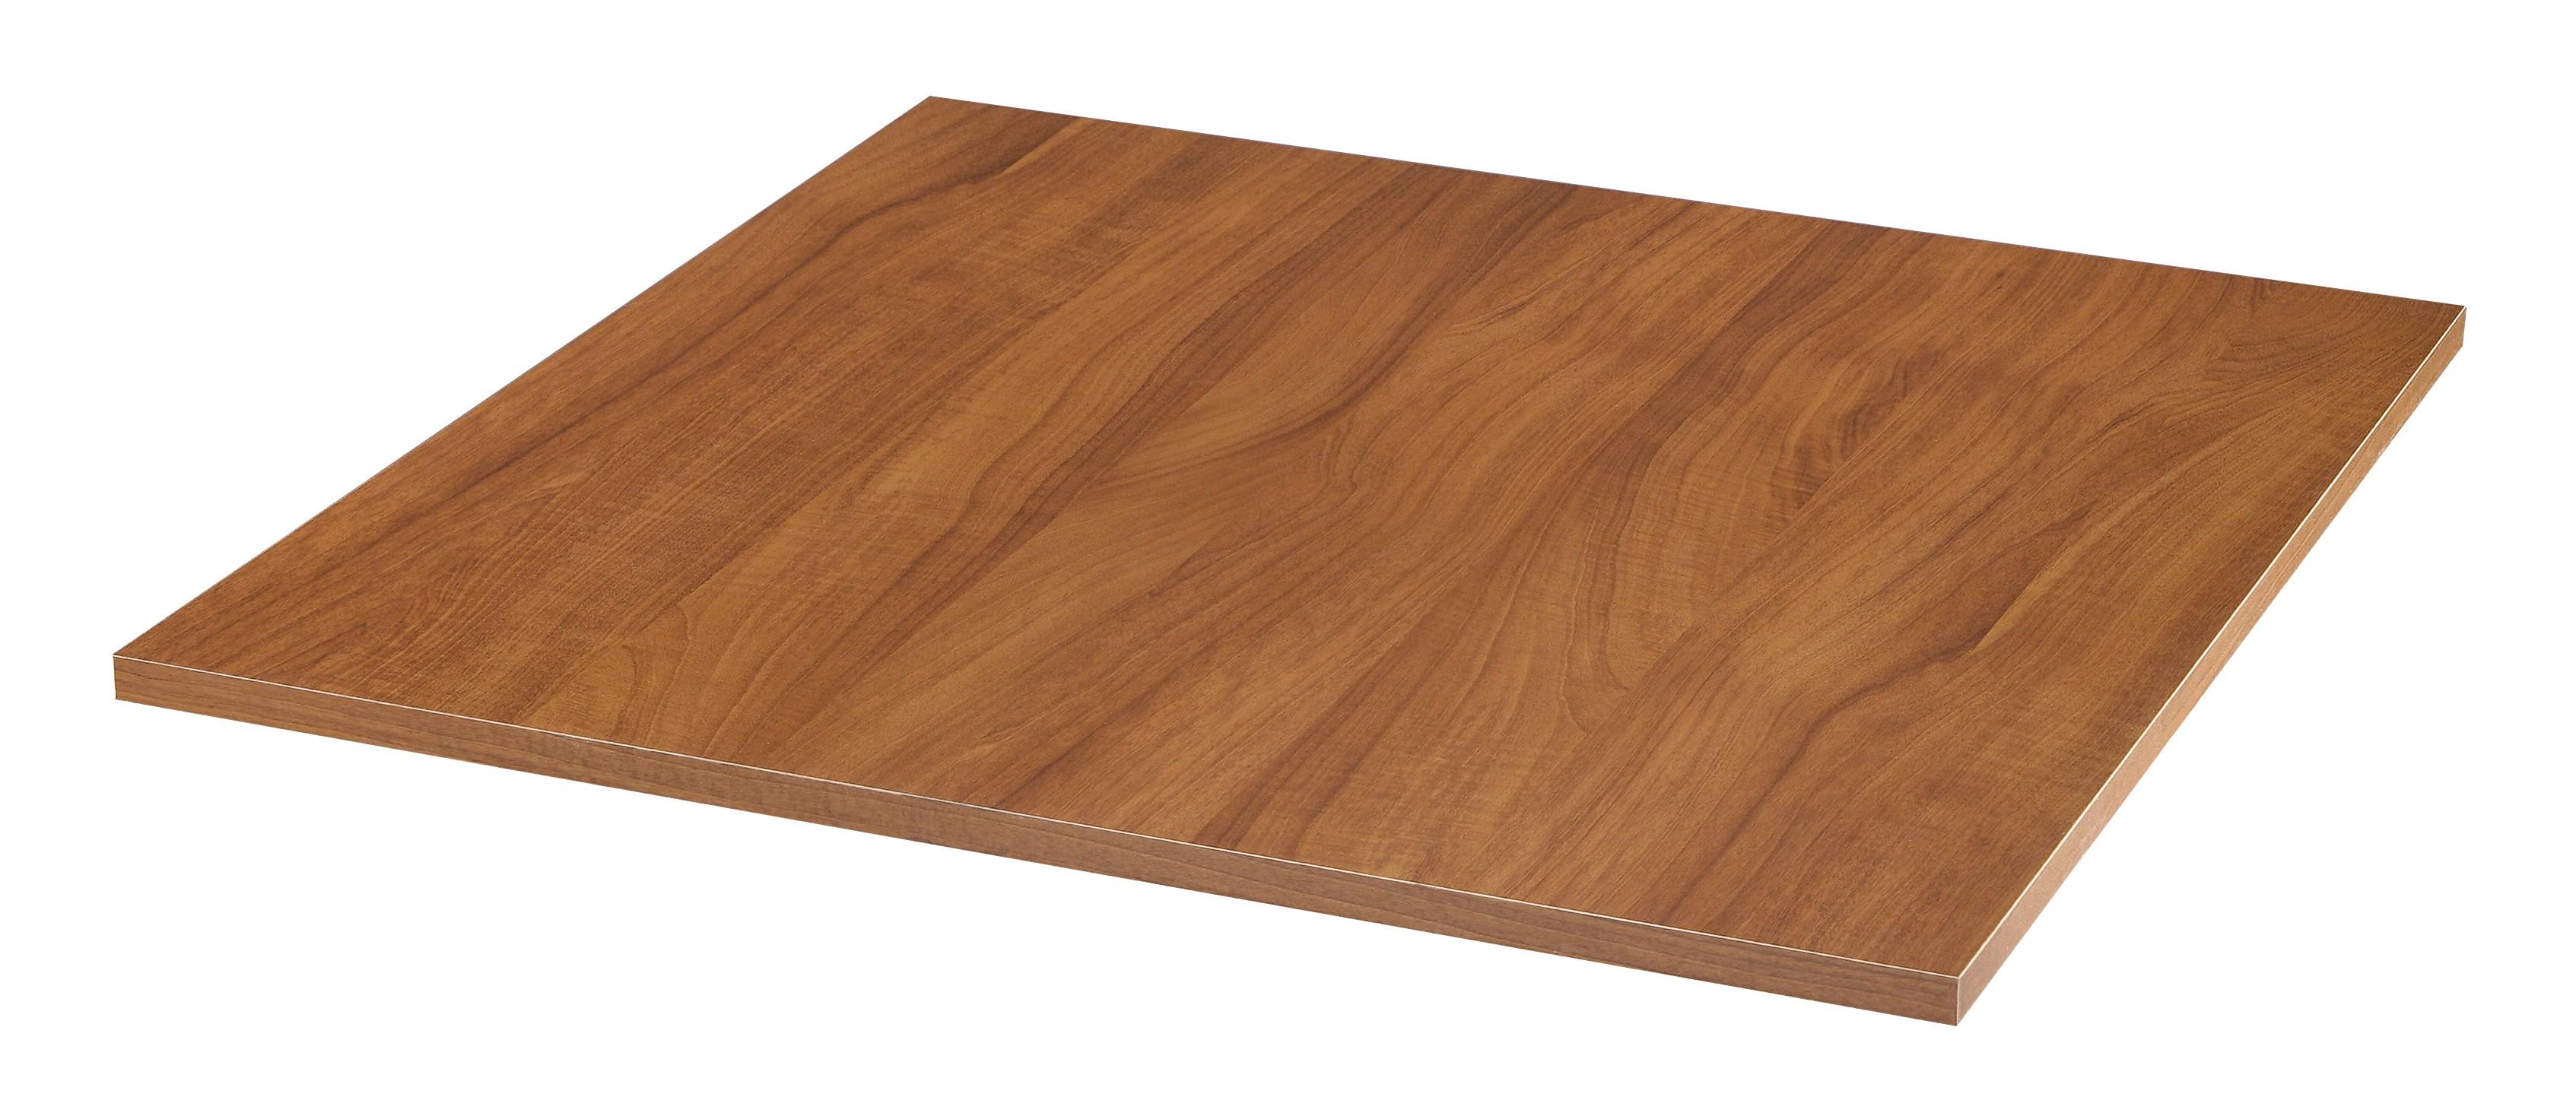 Tischplatte Melamin 22mm 80x80